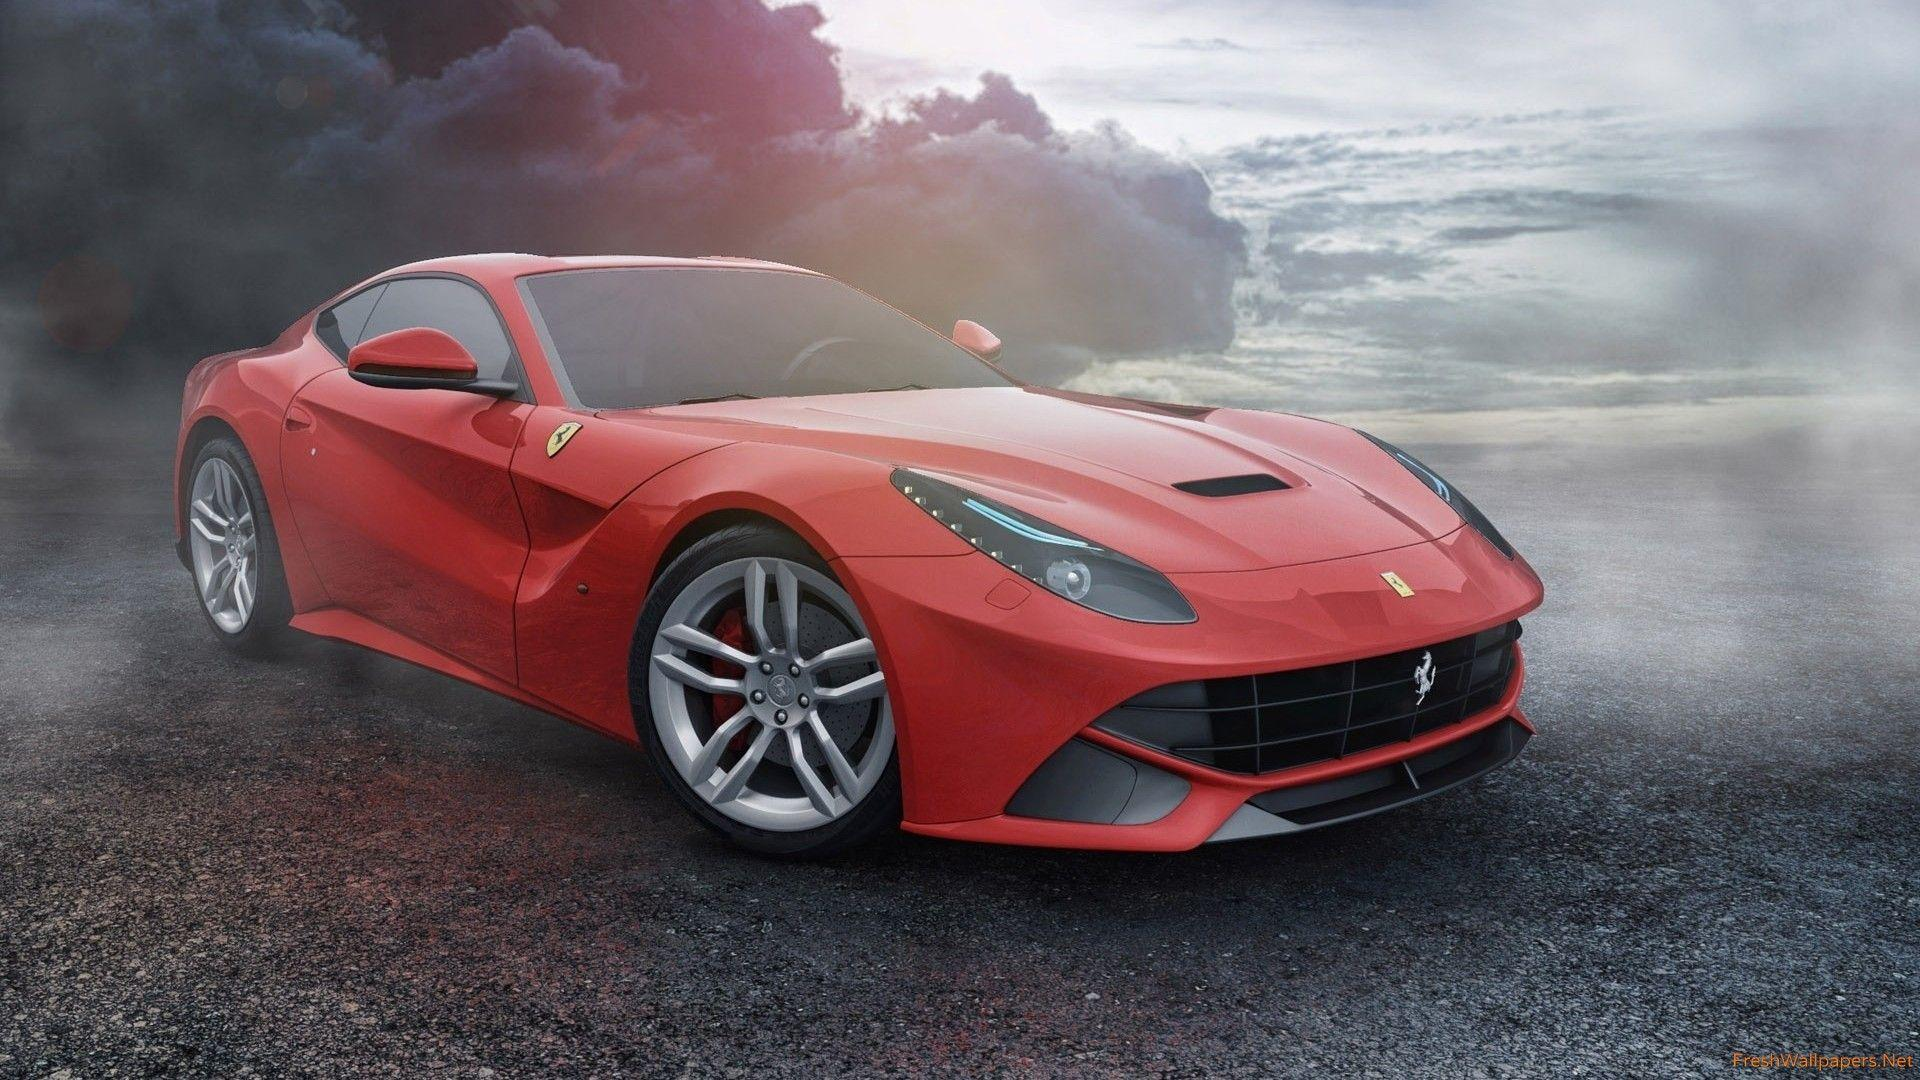 Background Ferrari Wallpaper Download